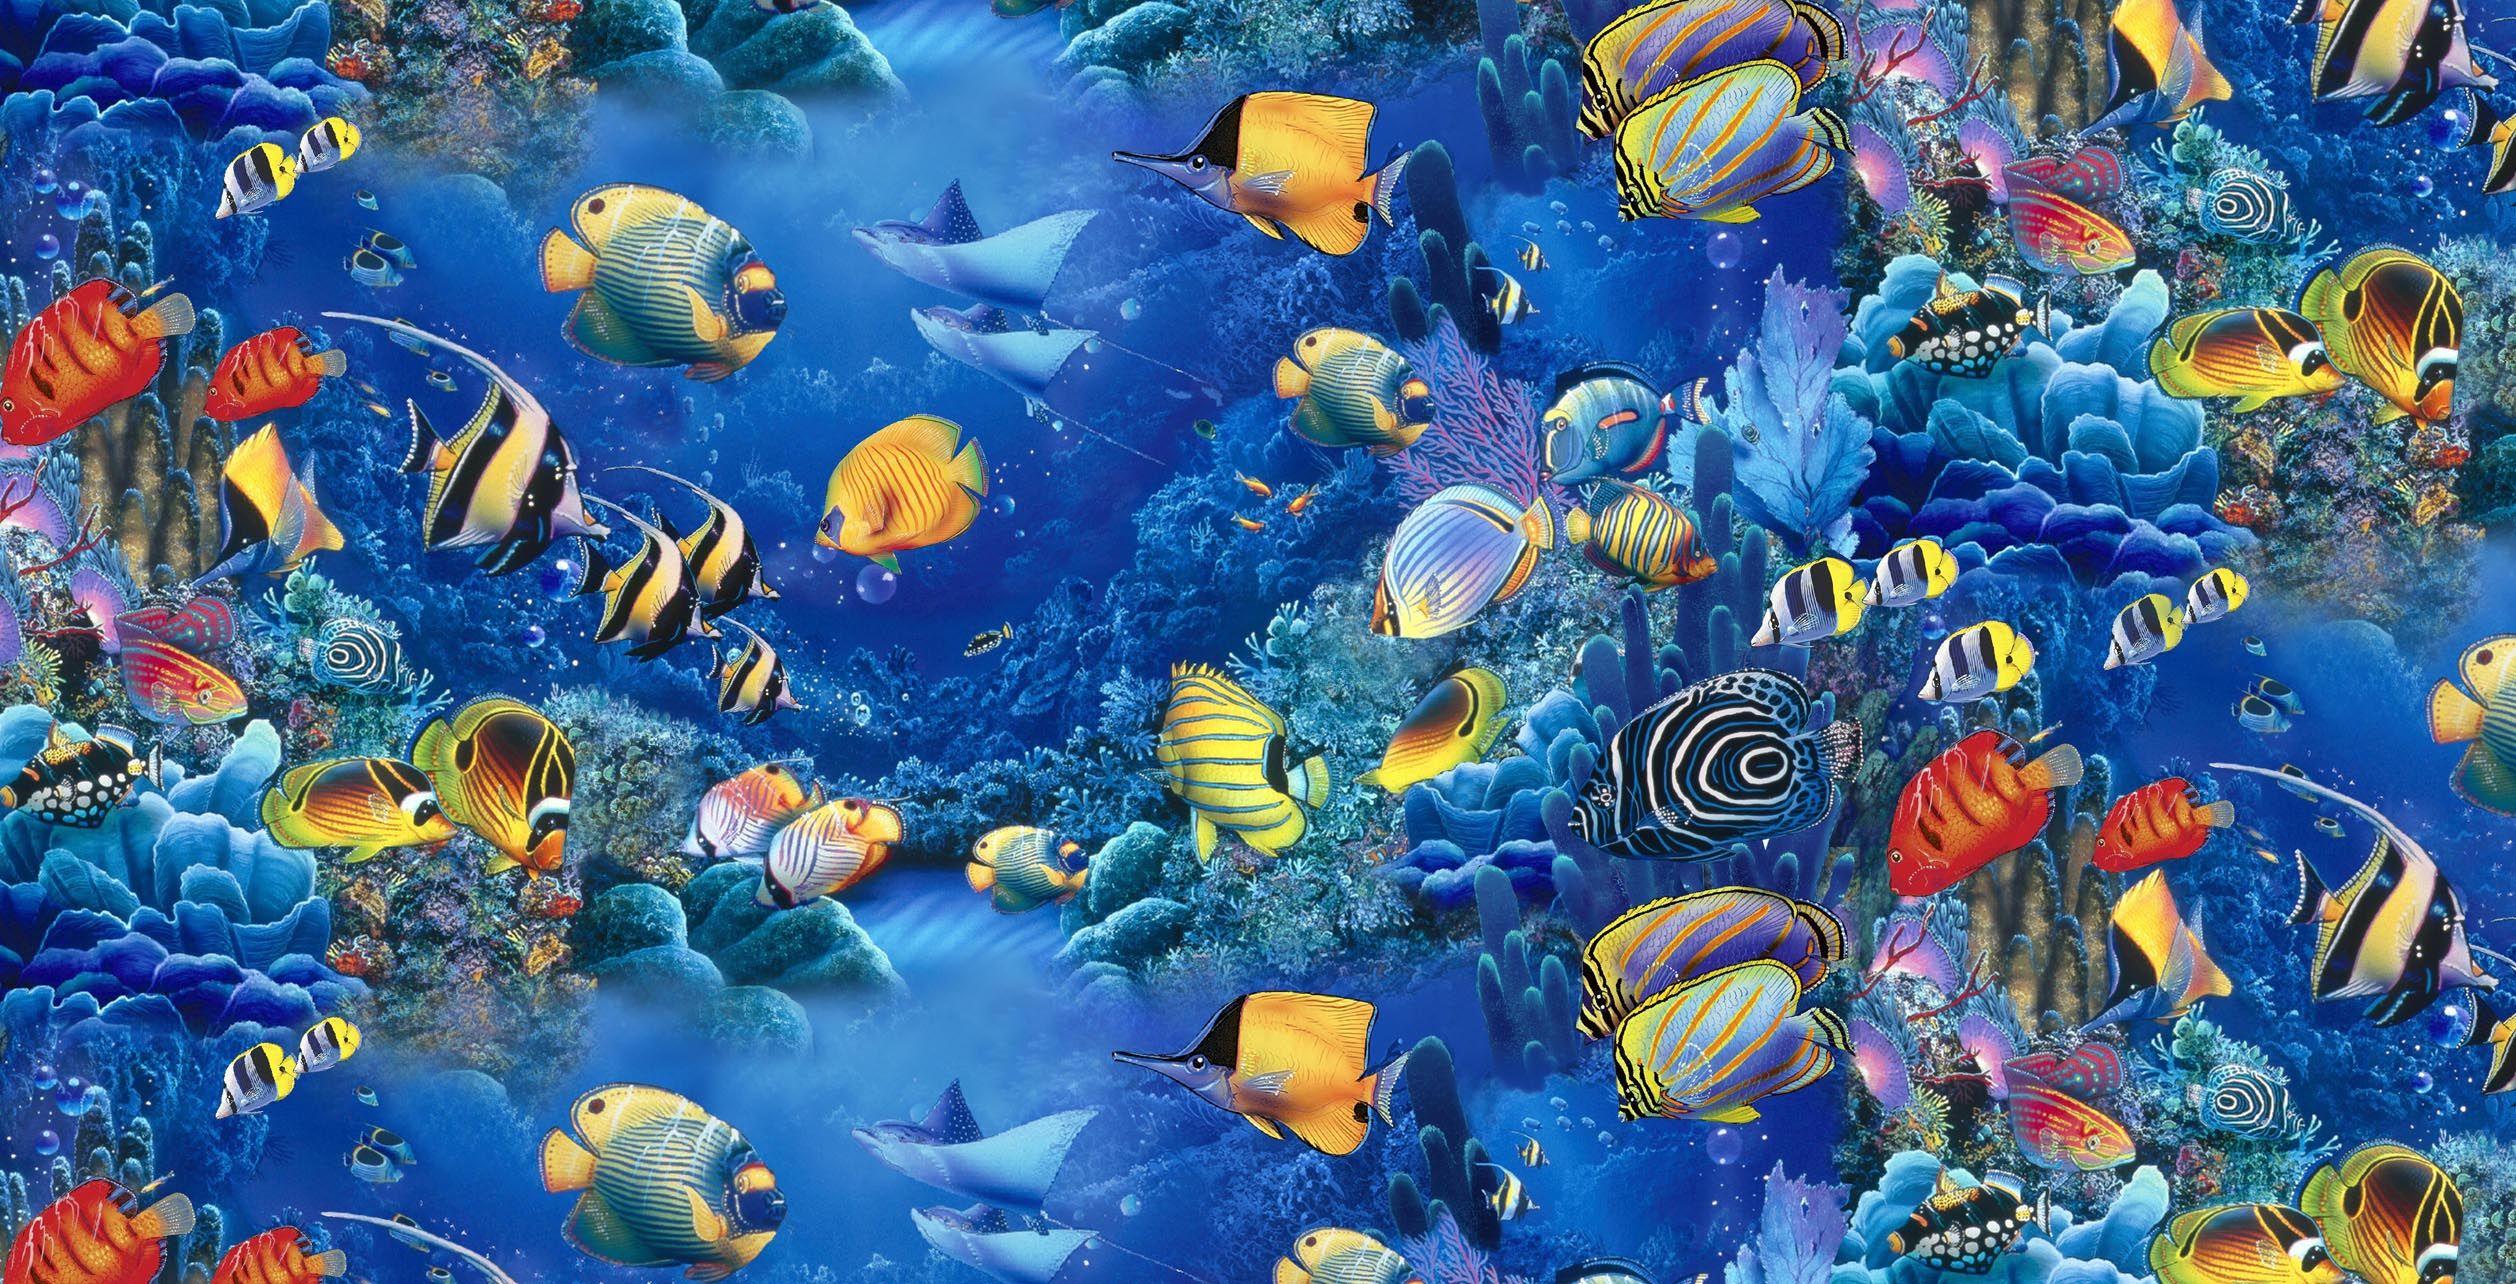 fish under the sea - Buscar con Google